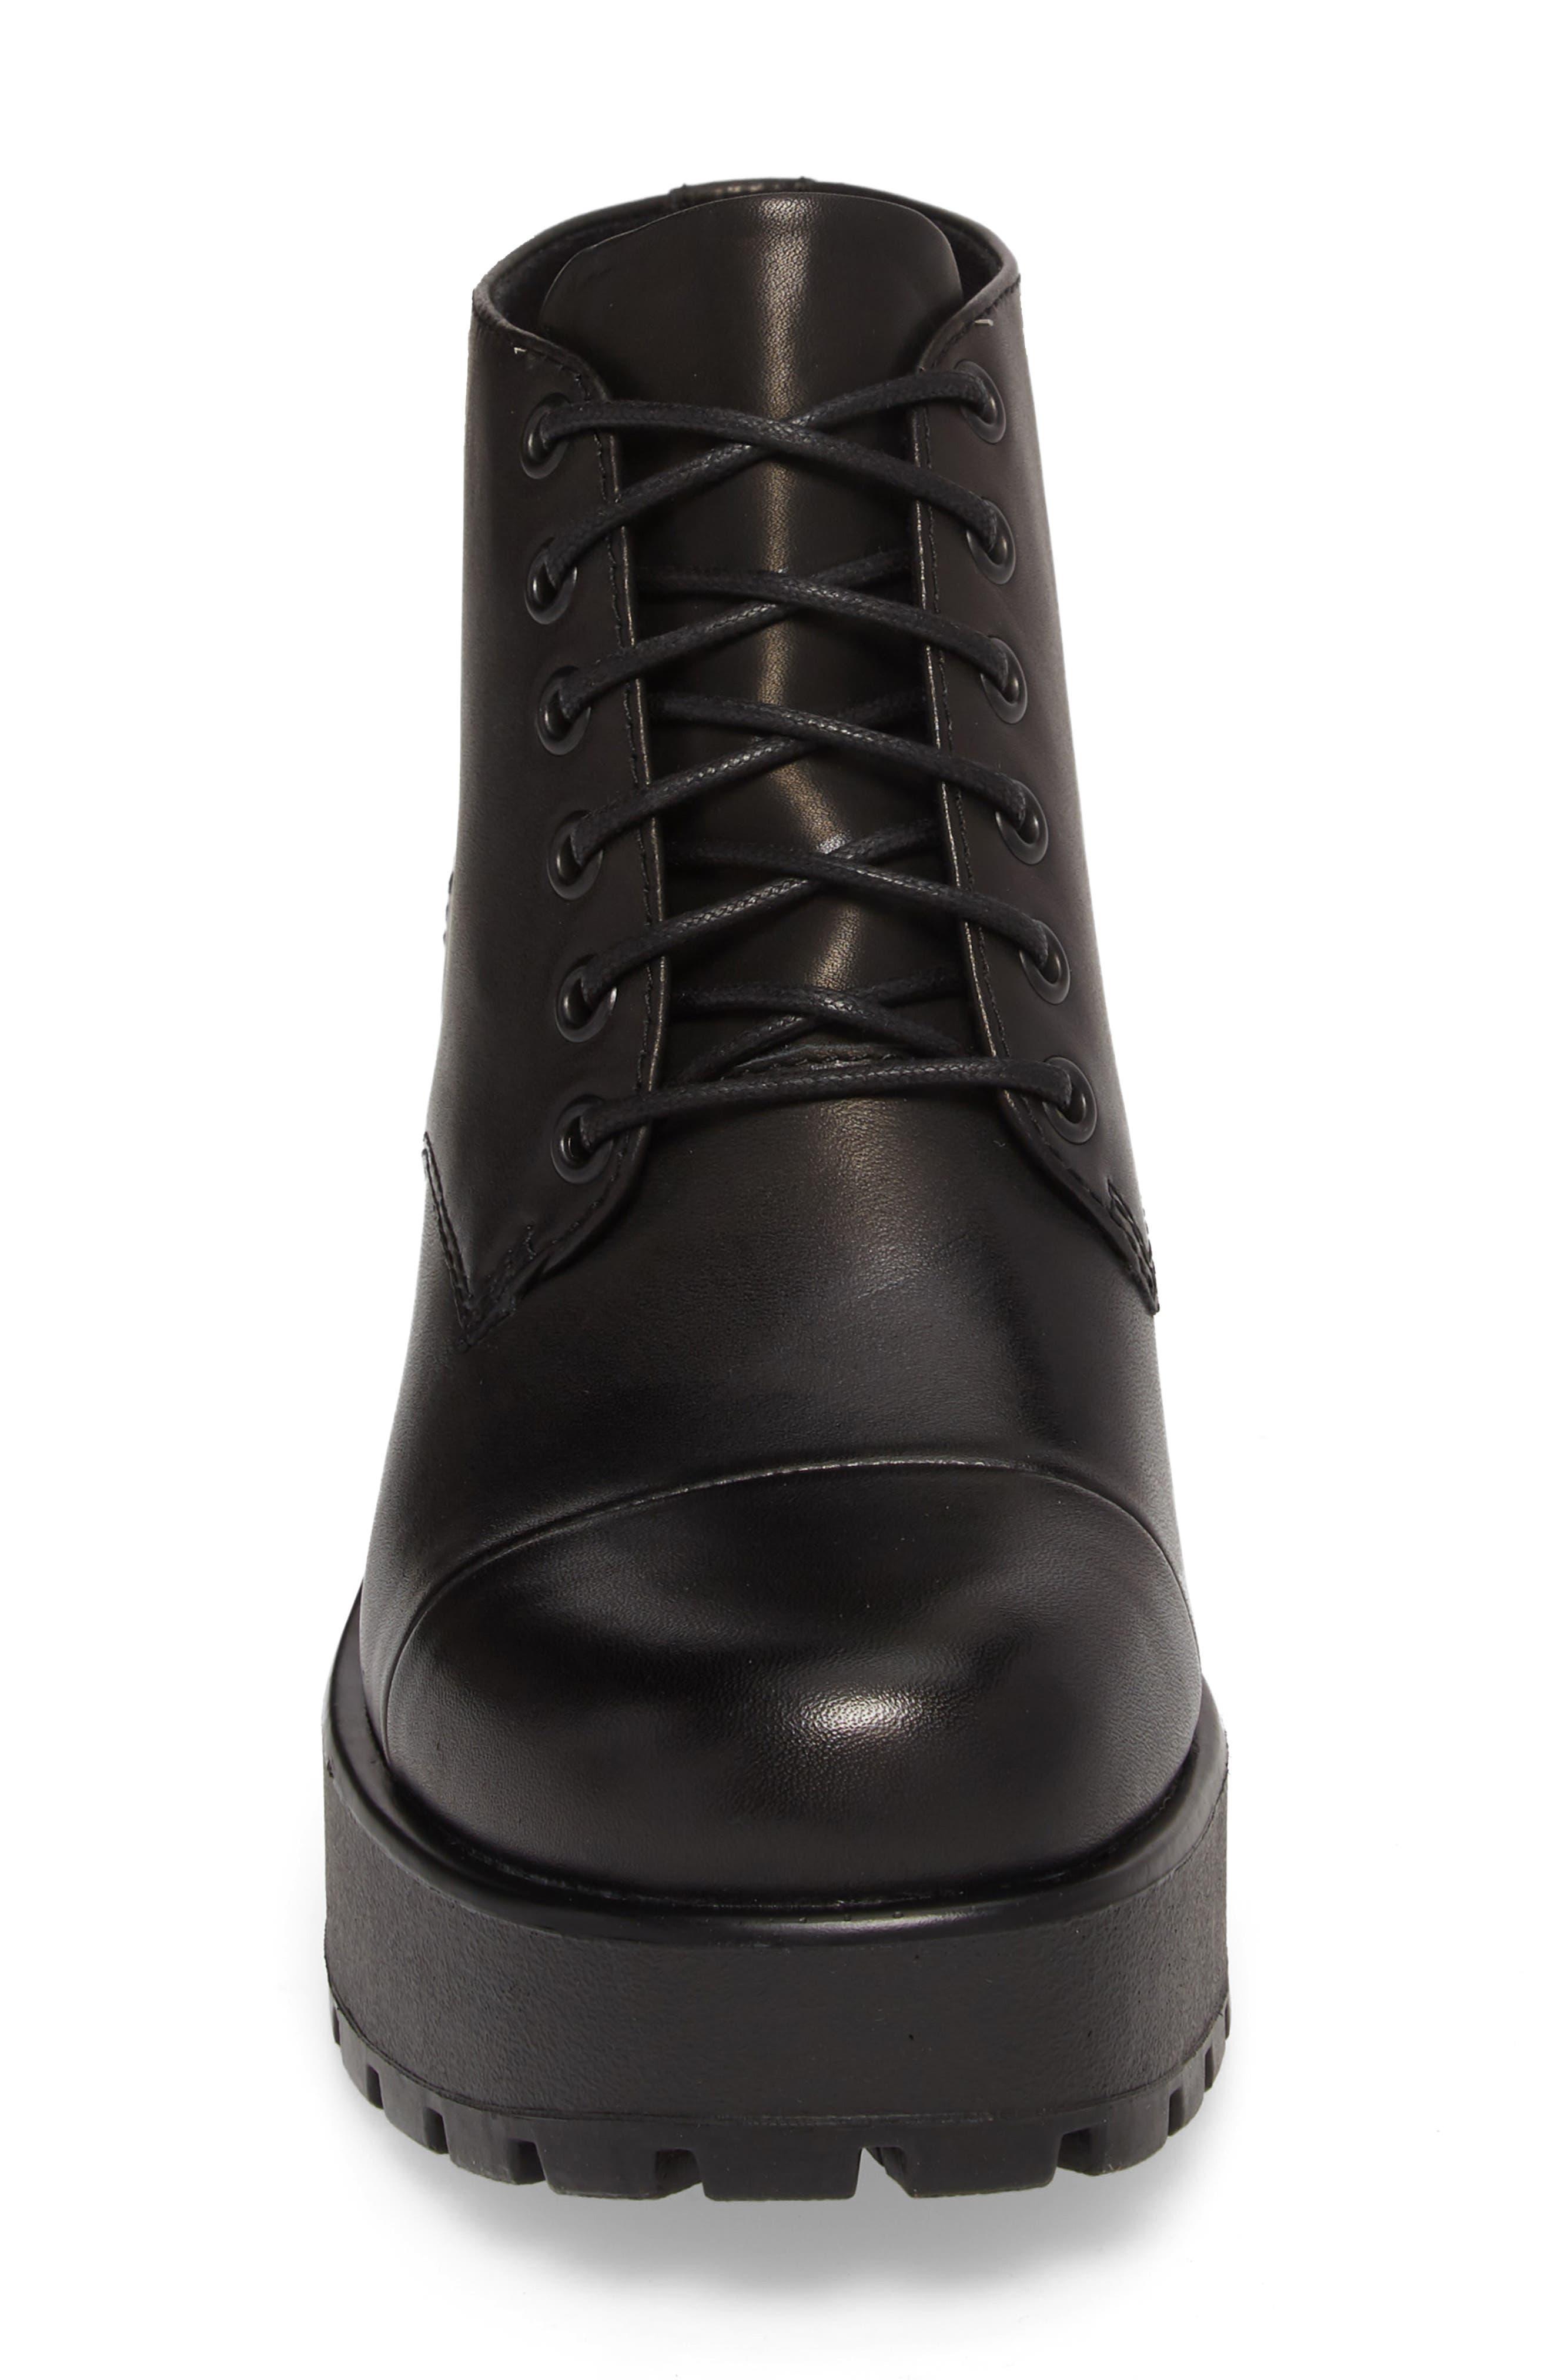 VAGABOND,                             Shoemakers Dioon Cap Toe Bootie,                             Alternate thumbnail 4, color,                             BLACK LEATHER